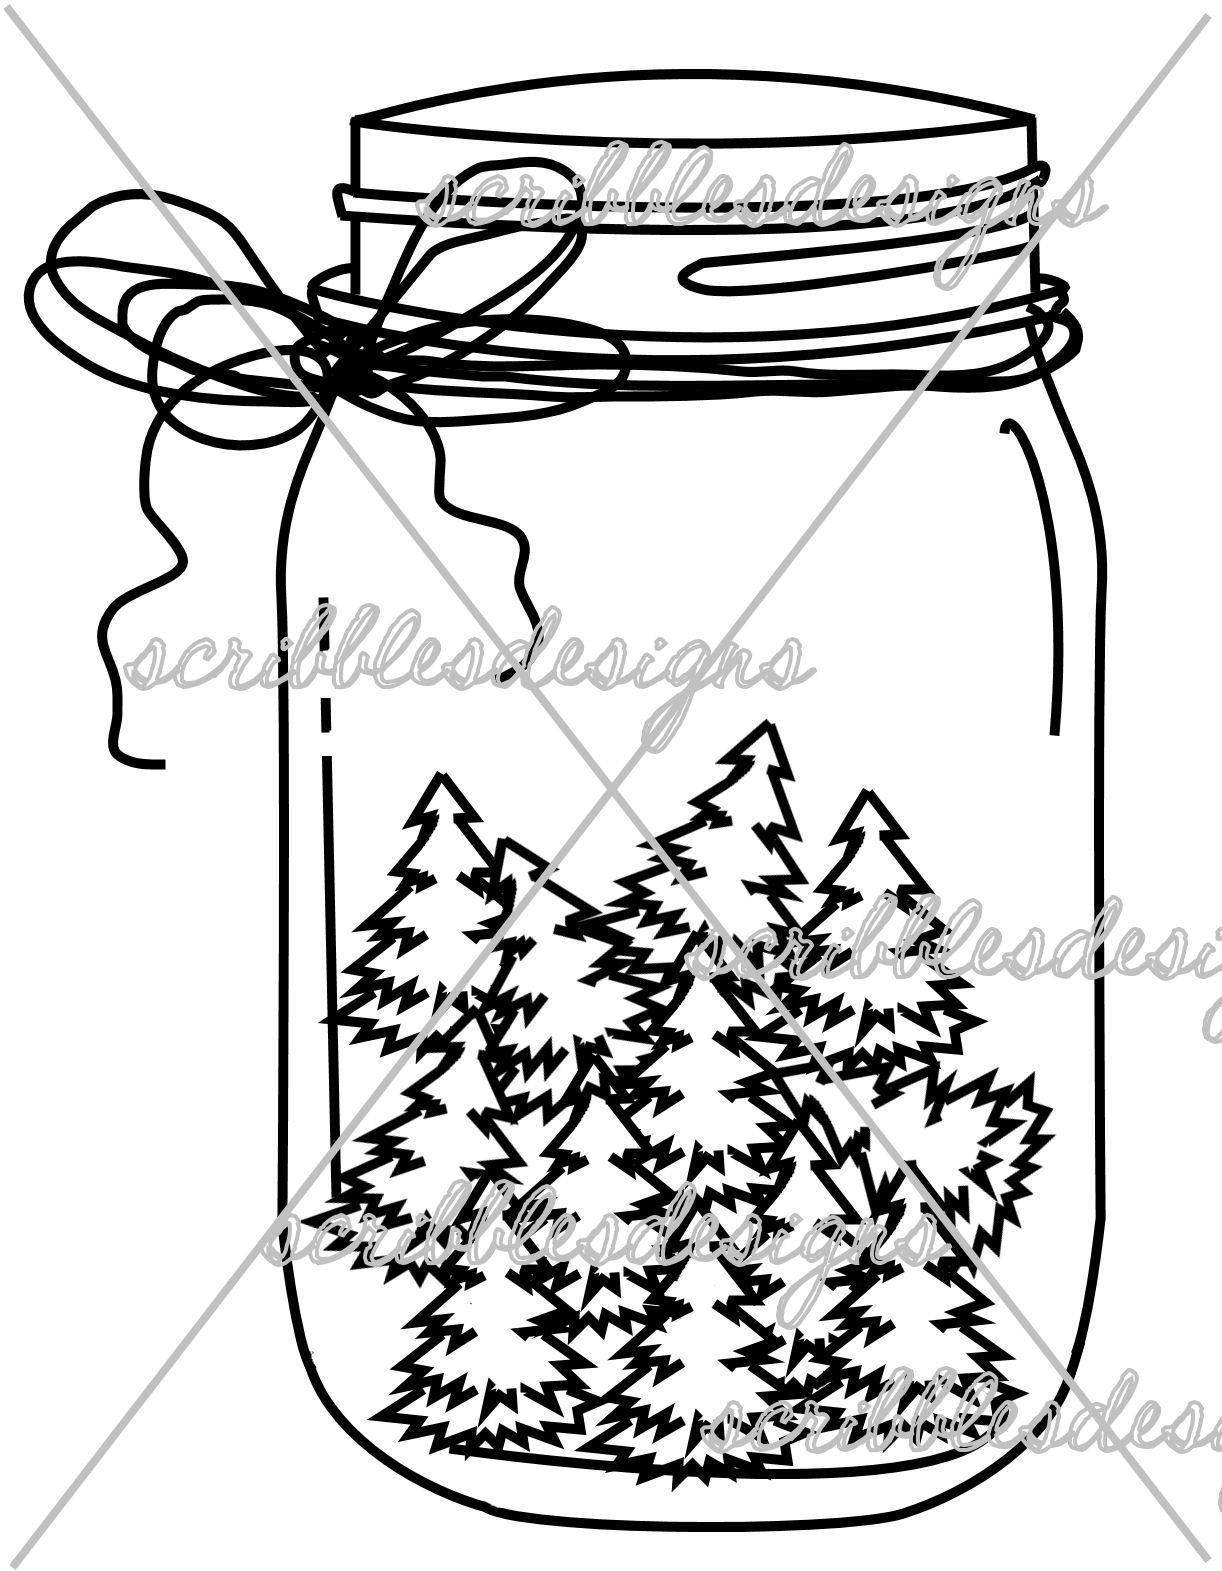 http://buyscribblesdesigns.blogspot.ca/2015/03/894-holiday-tree-mason-jar-300.html